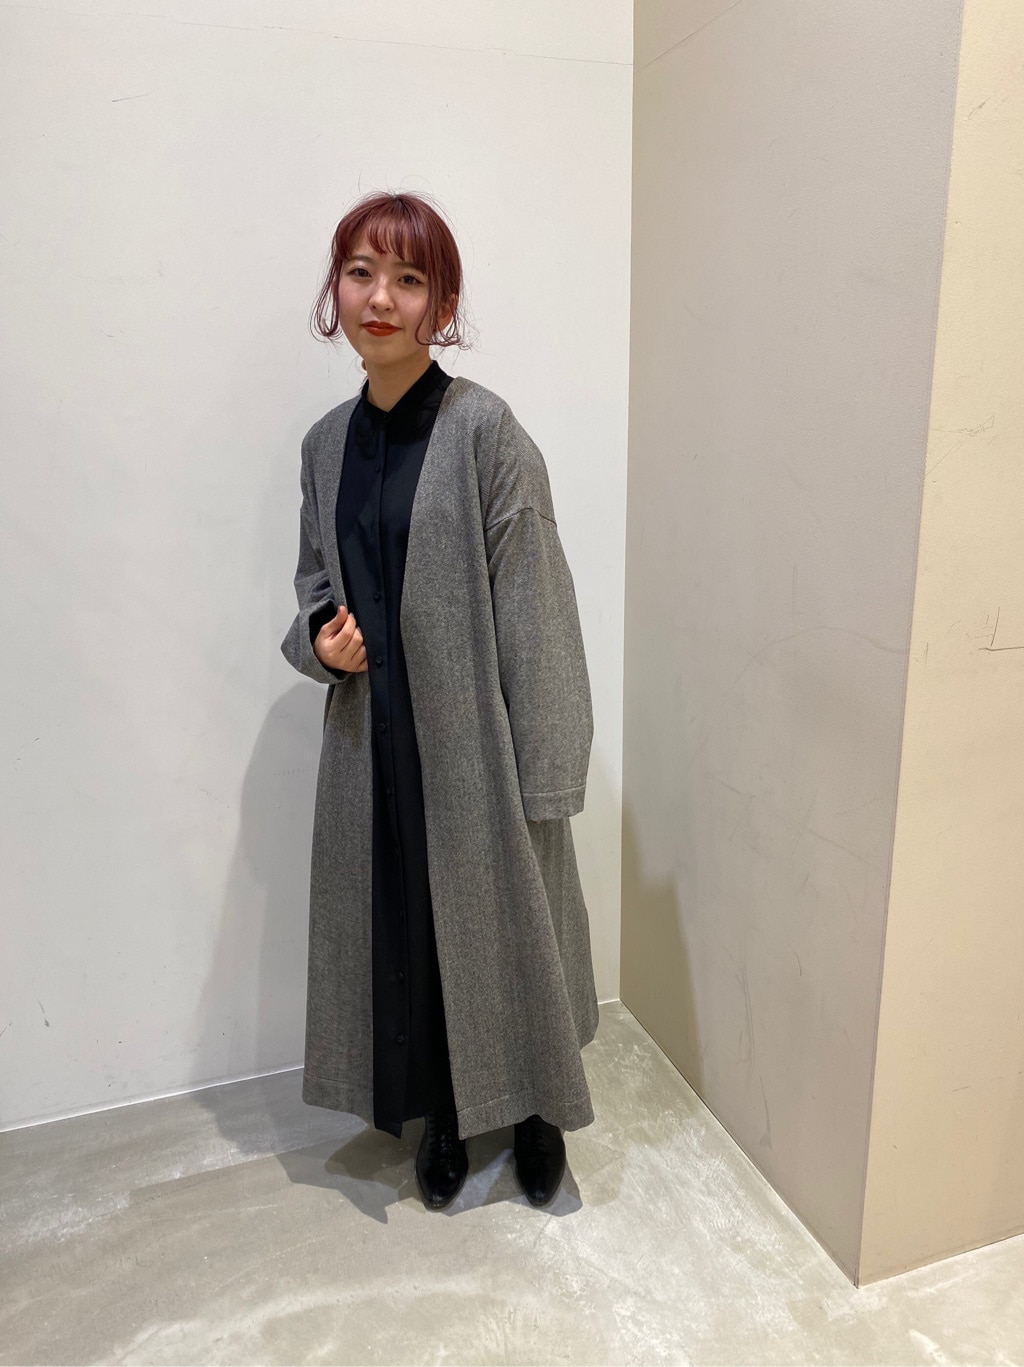 bulle de savon 阪急西宮ガーデンズ 身長:150cm 2020.11.09